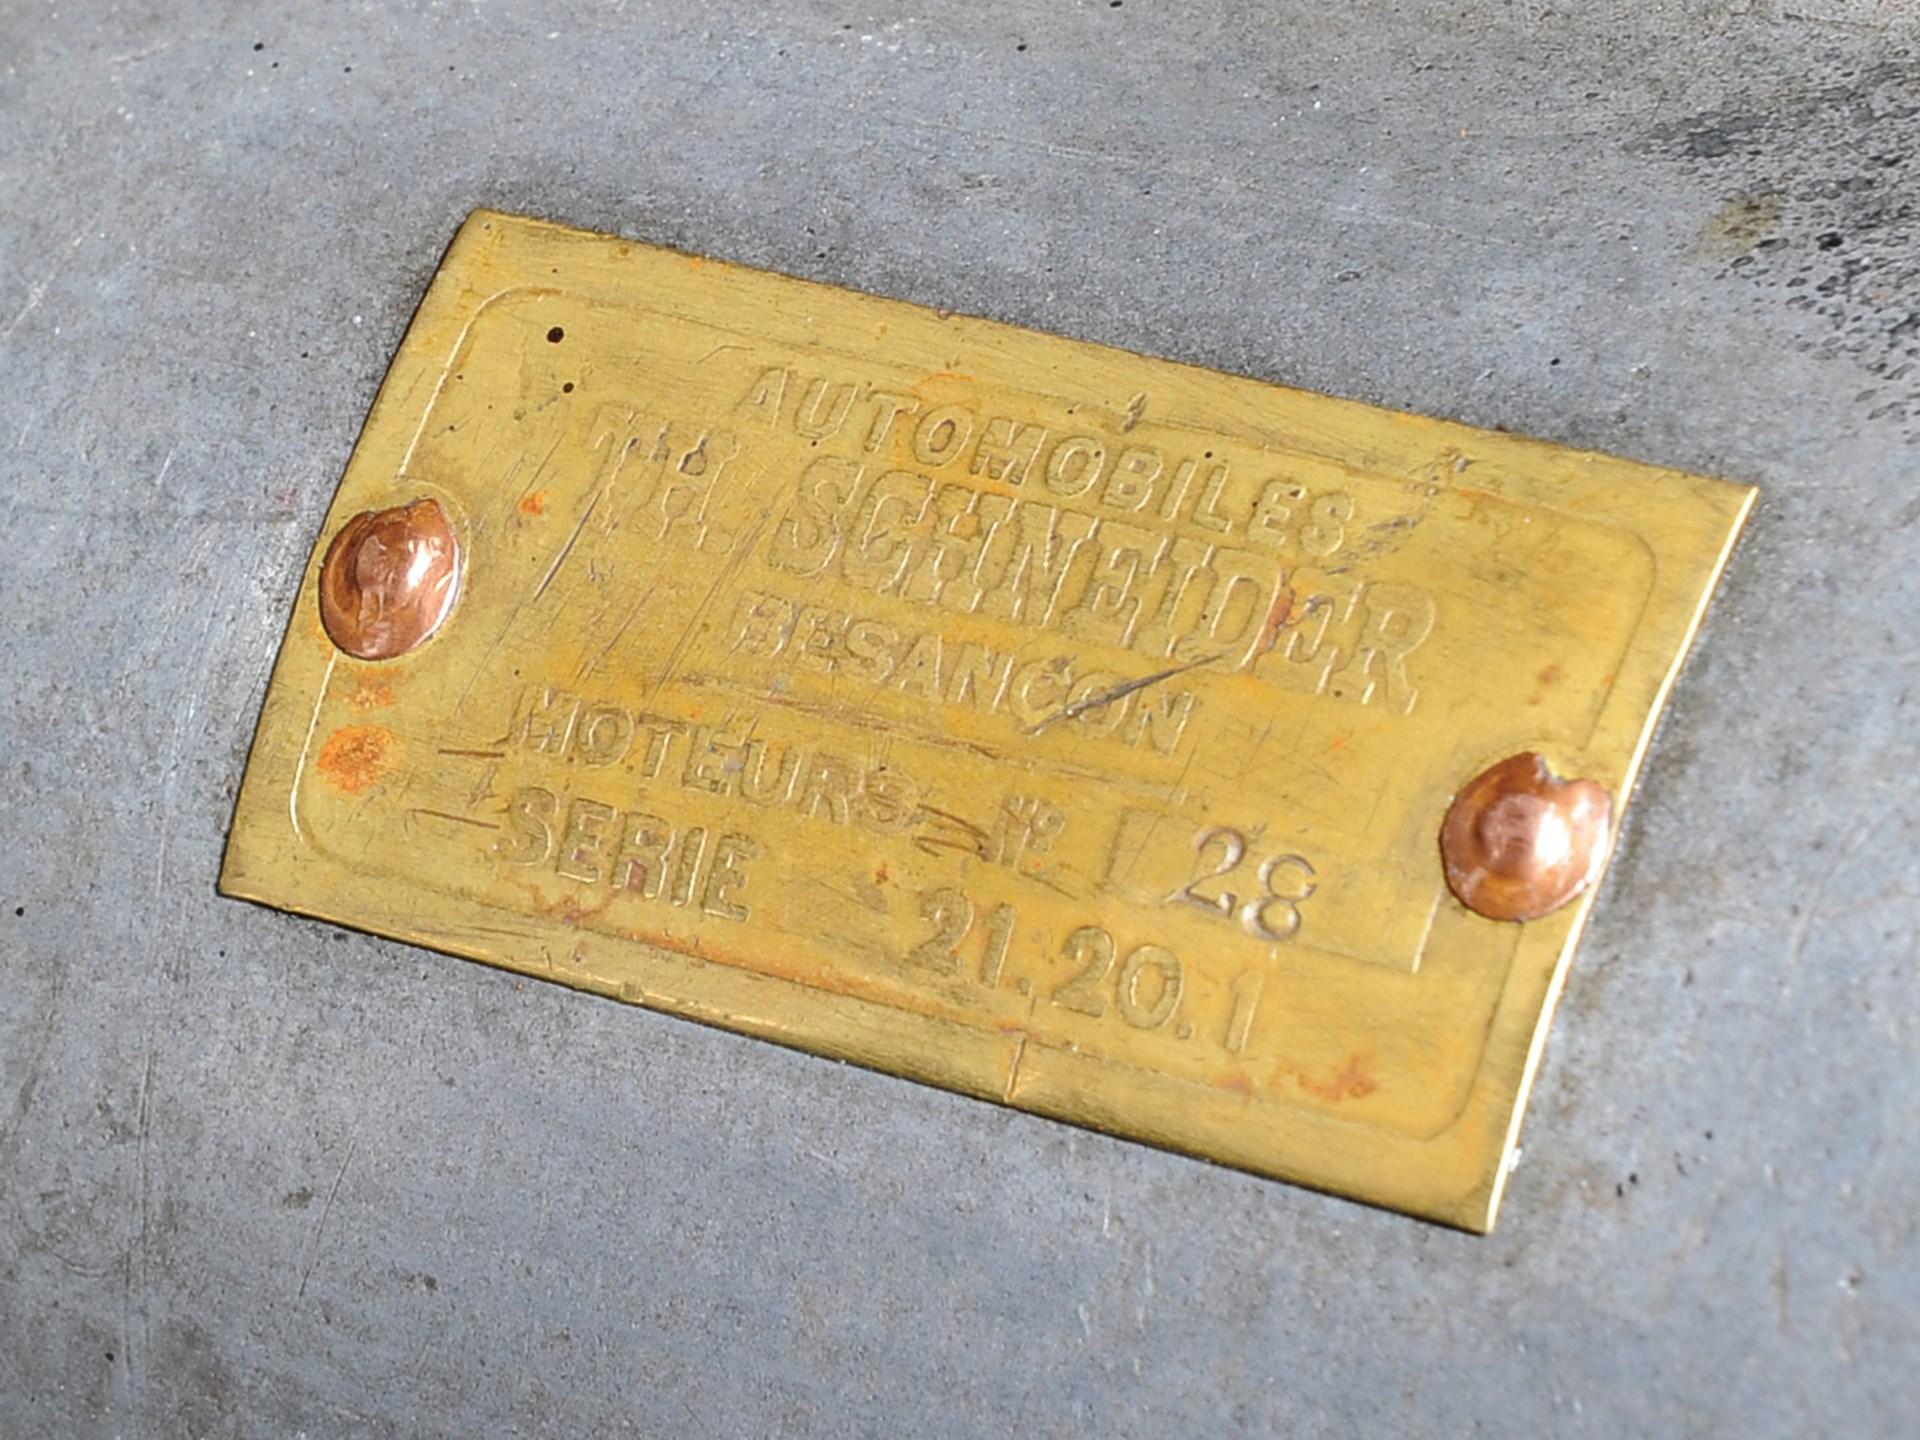 1921 Th. Schneider 4½-Litre Tourer by Domain